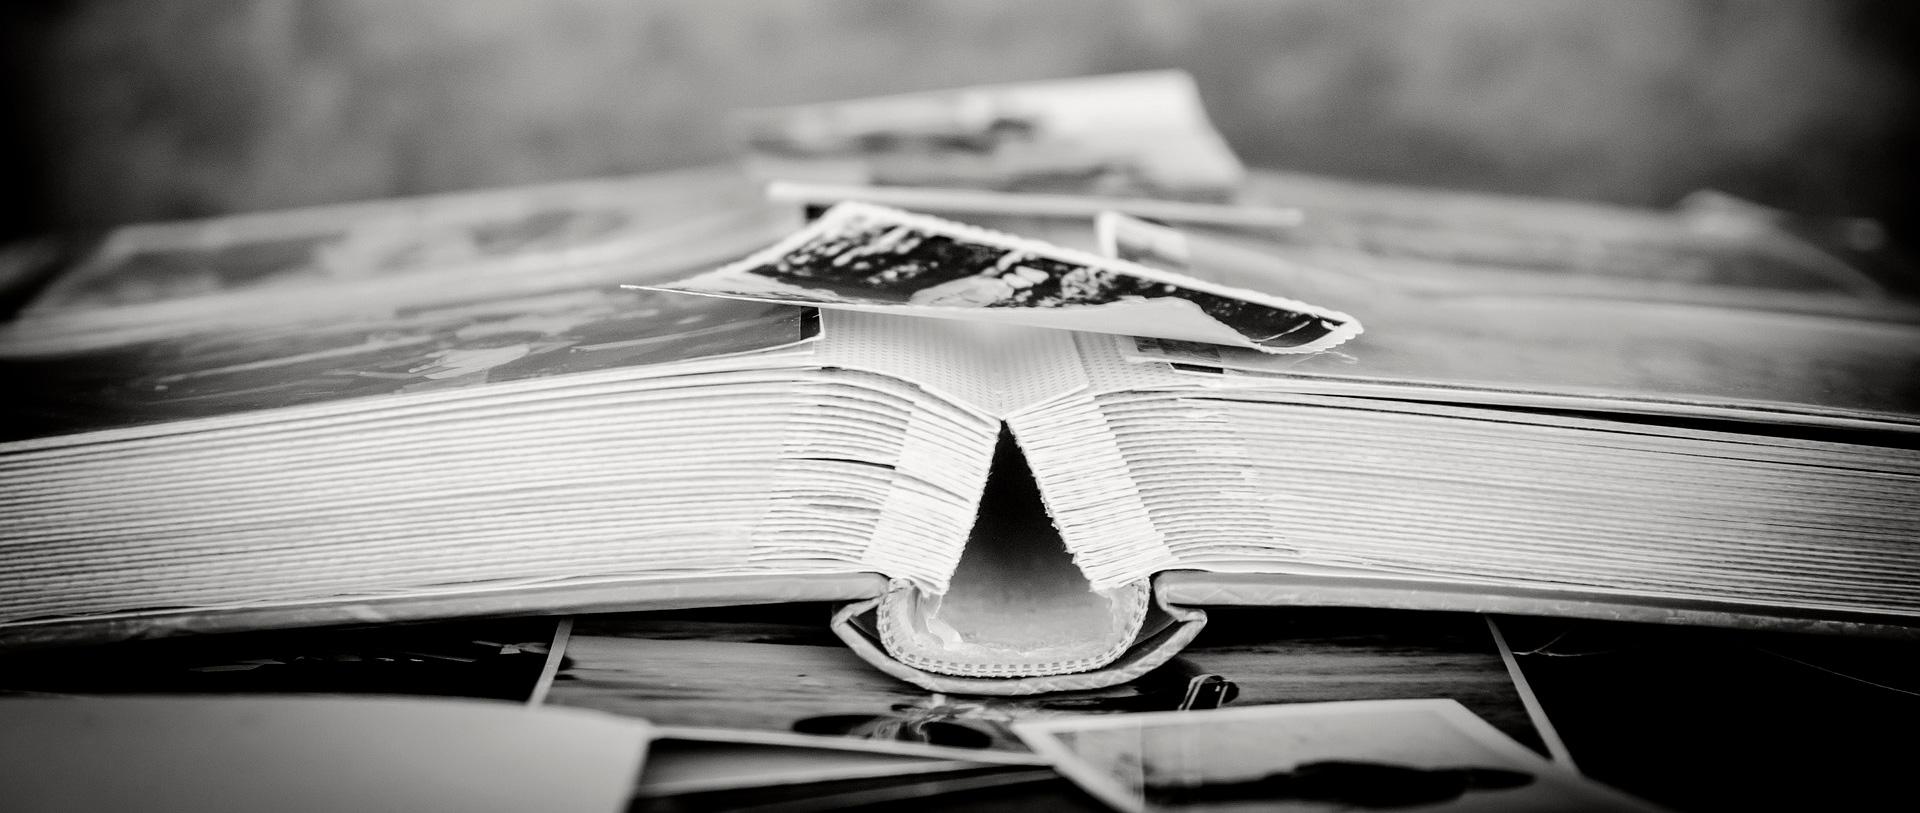 Fotografo book de fotos